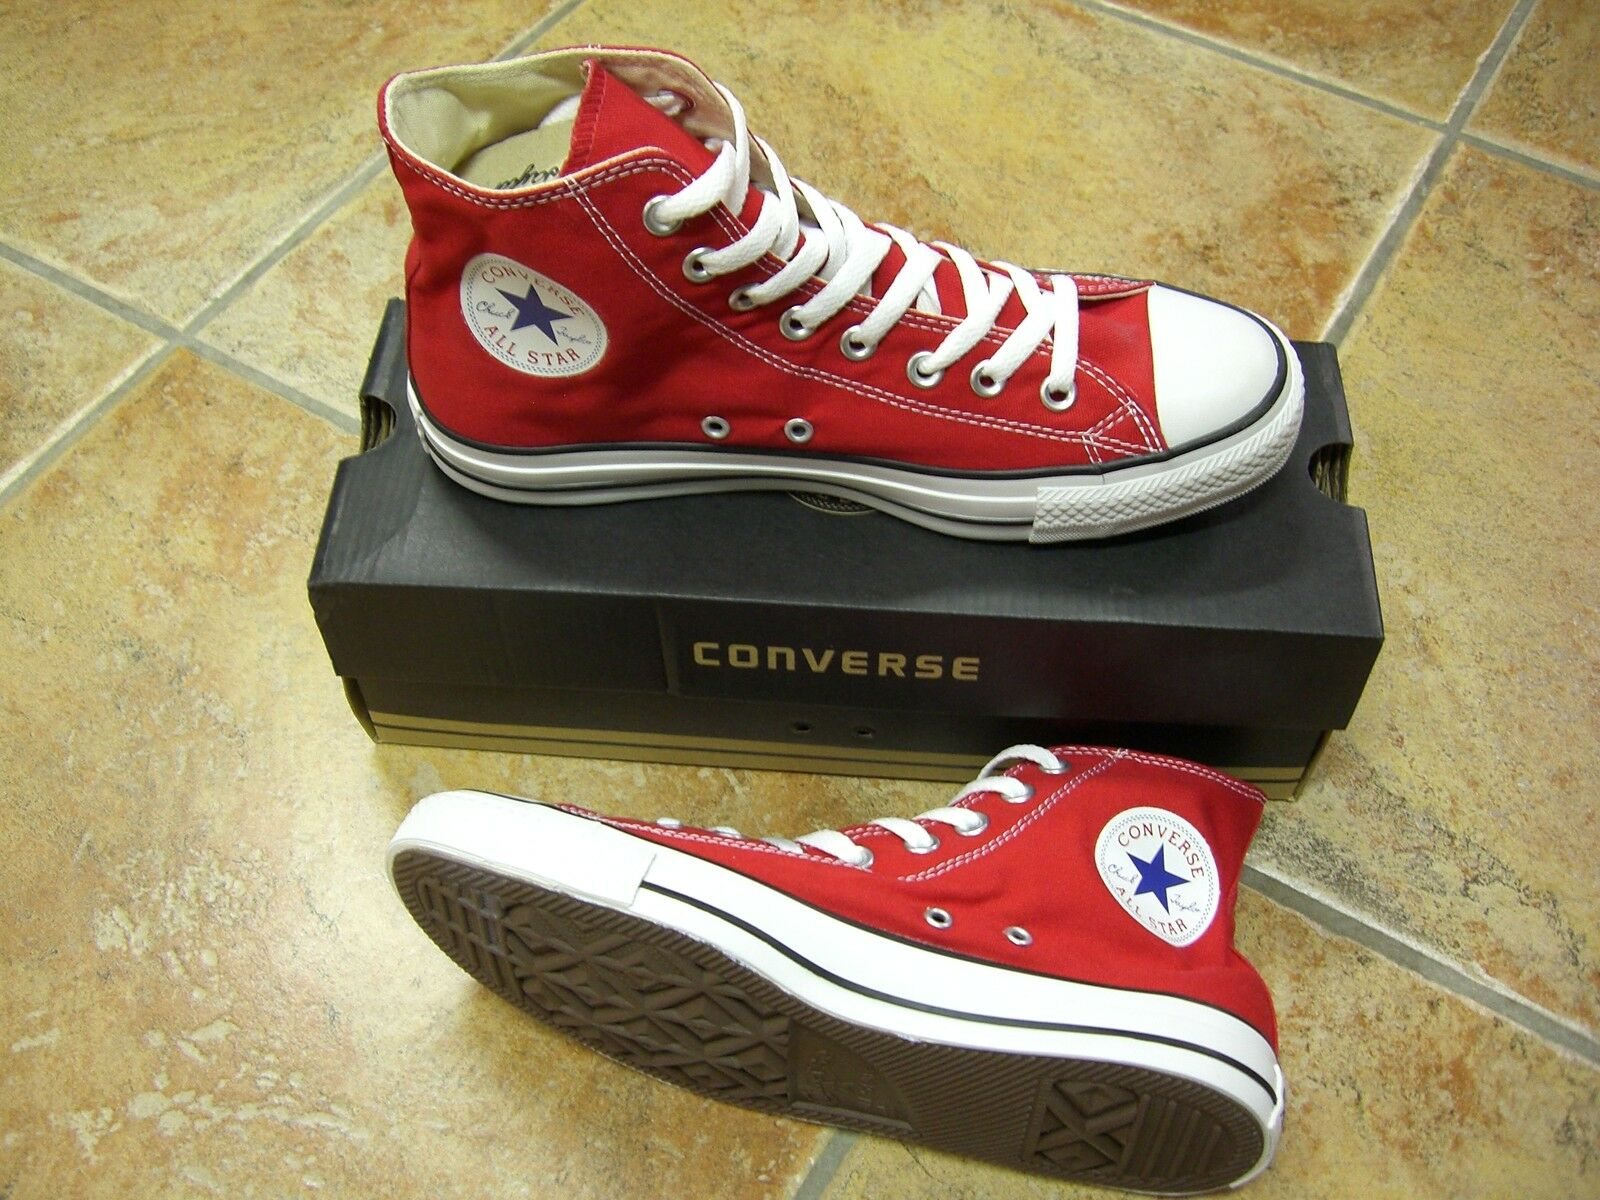 Converse Chucks All Star HI Gr.46,5 Red M9621 Rot Neu